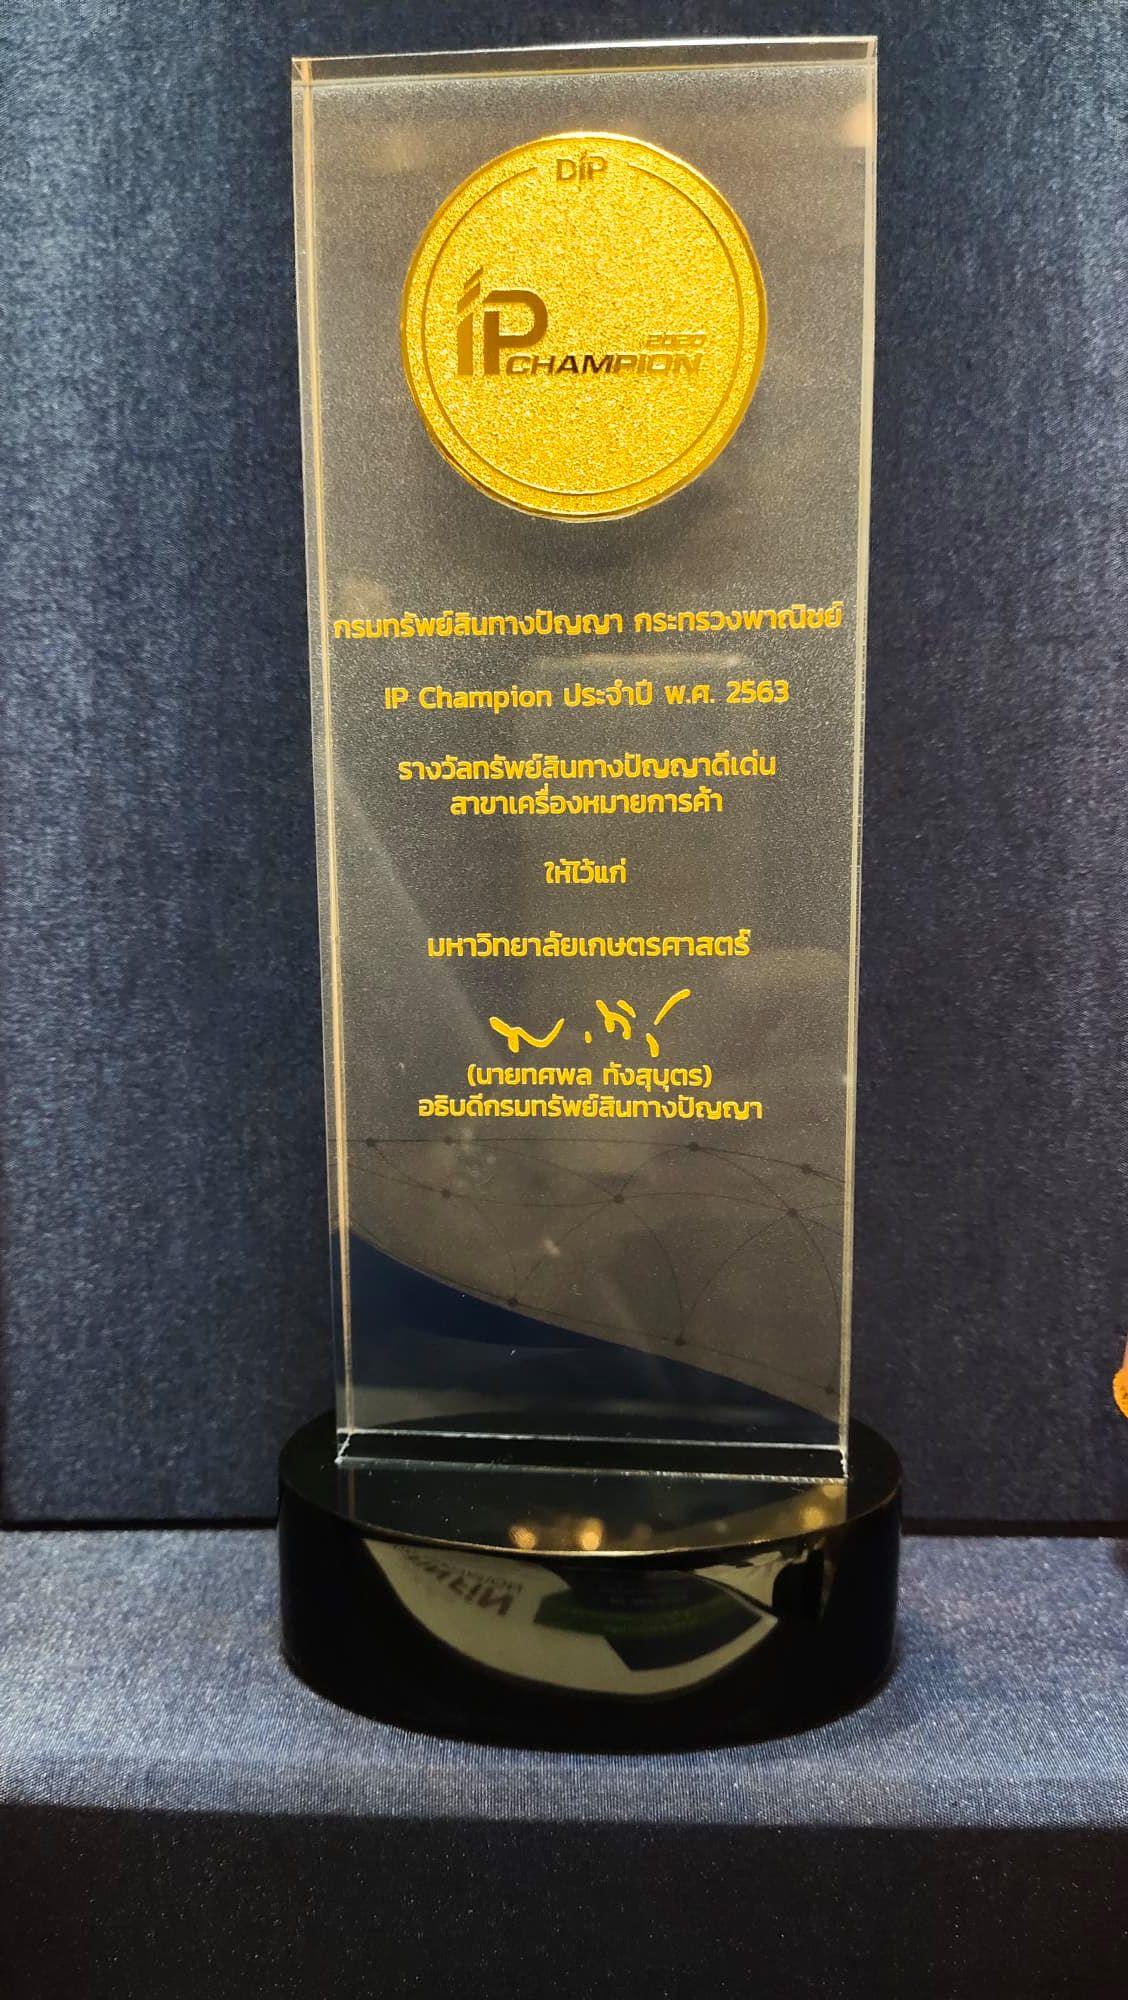 FiNFiN INNOVATION มหาวิทยาลัยเกษตรศาสตร์ ได้รับรางวัล IP Champion ประจำปี พ.ศ. 2563 สาขาเครื่องหมายการค้า ประเภท สถาบันอุดมศึกษาหรือหน่วยงานของรัฐที่มิใช่รัฐวิสาหกิจ